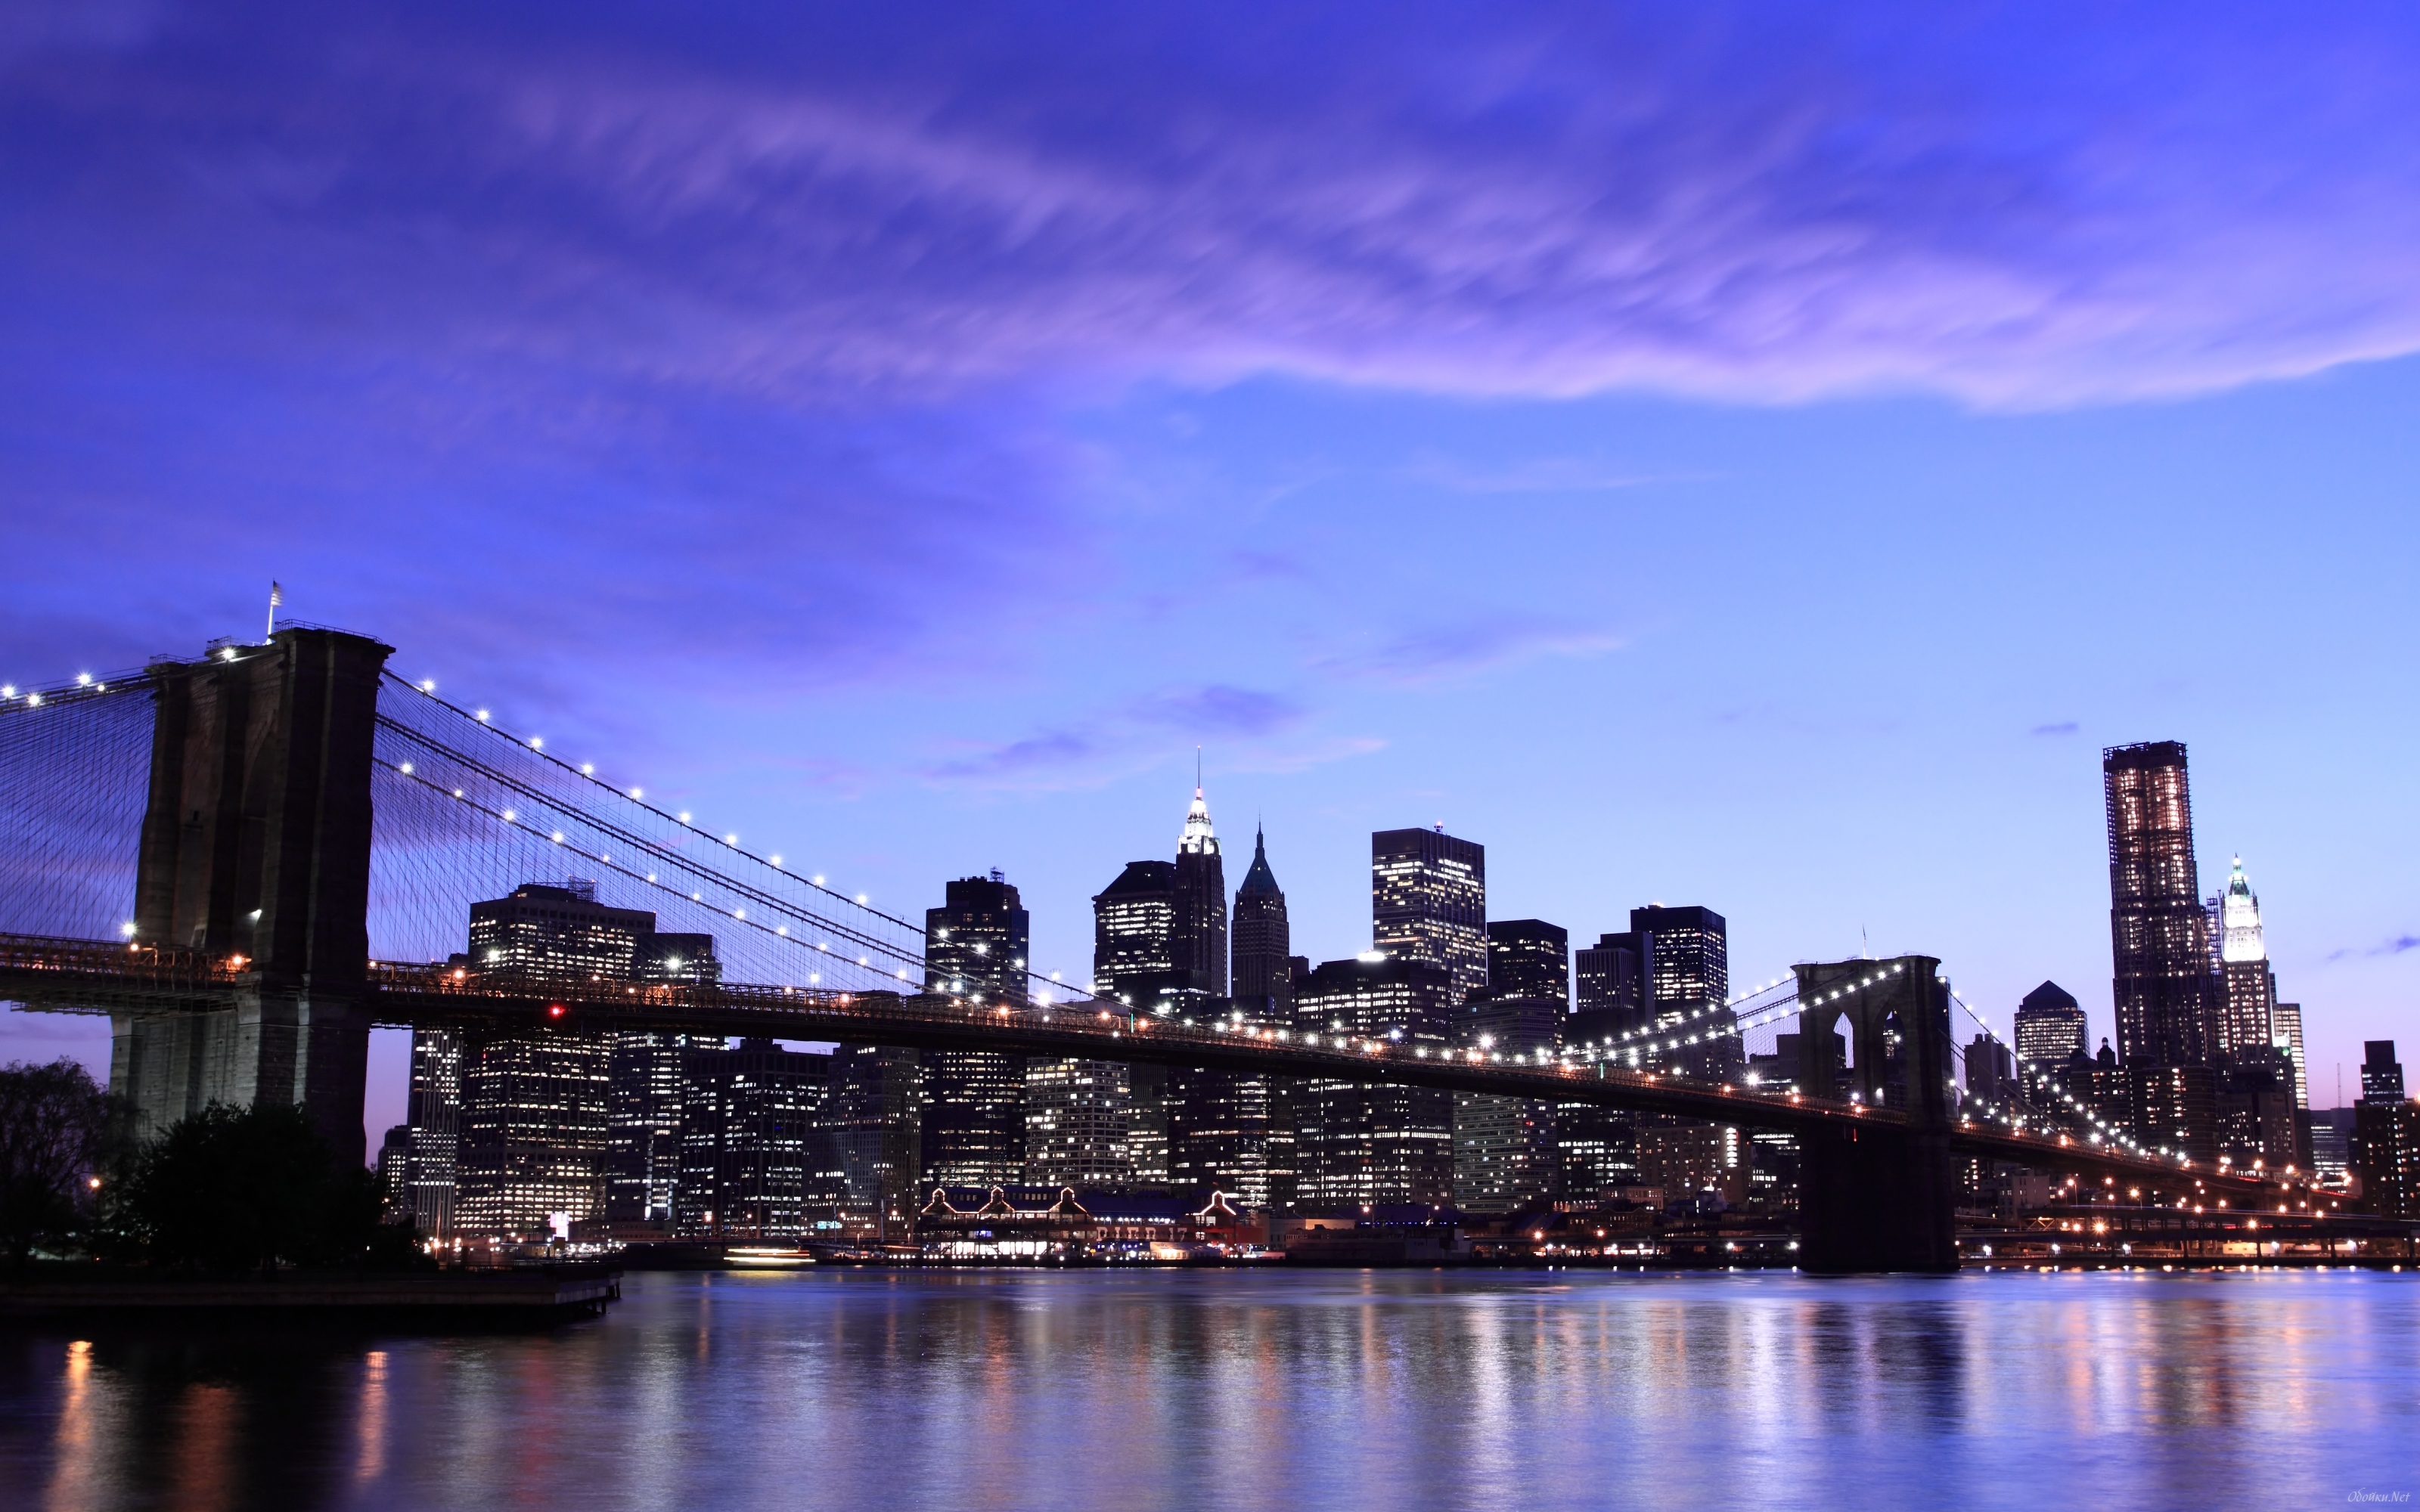 Download Impressive New York City Hd Desktop Wallpaper Hd Desktop